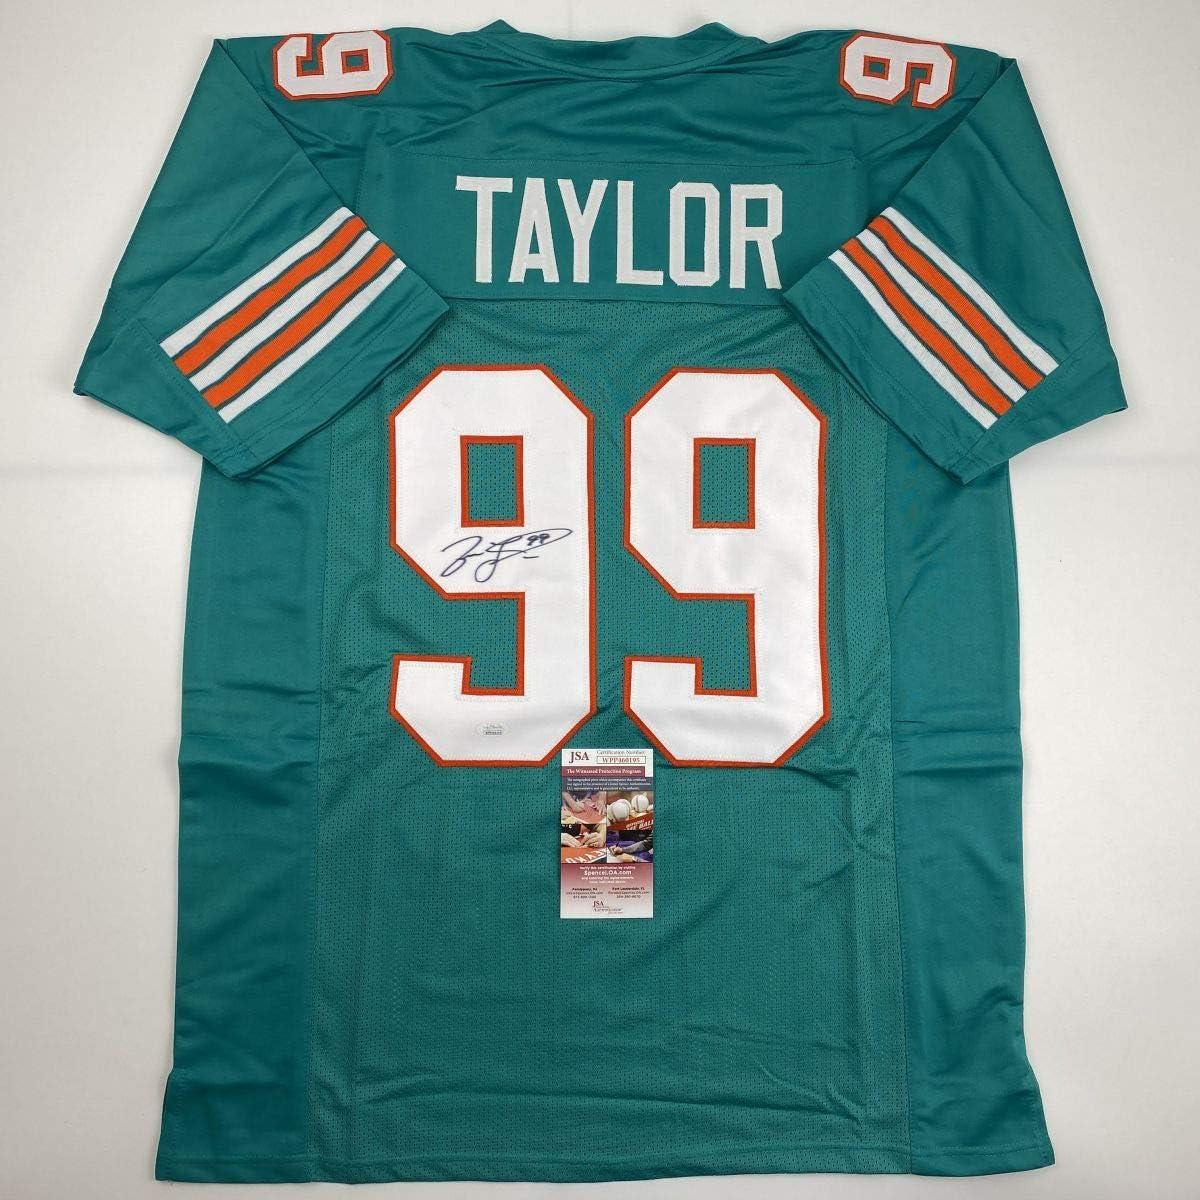 Autographed/Signed Jason Taylor Miami Teal Football Jersey JSA COA